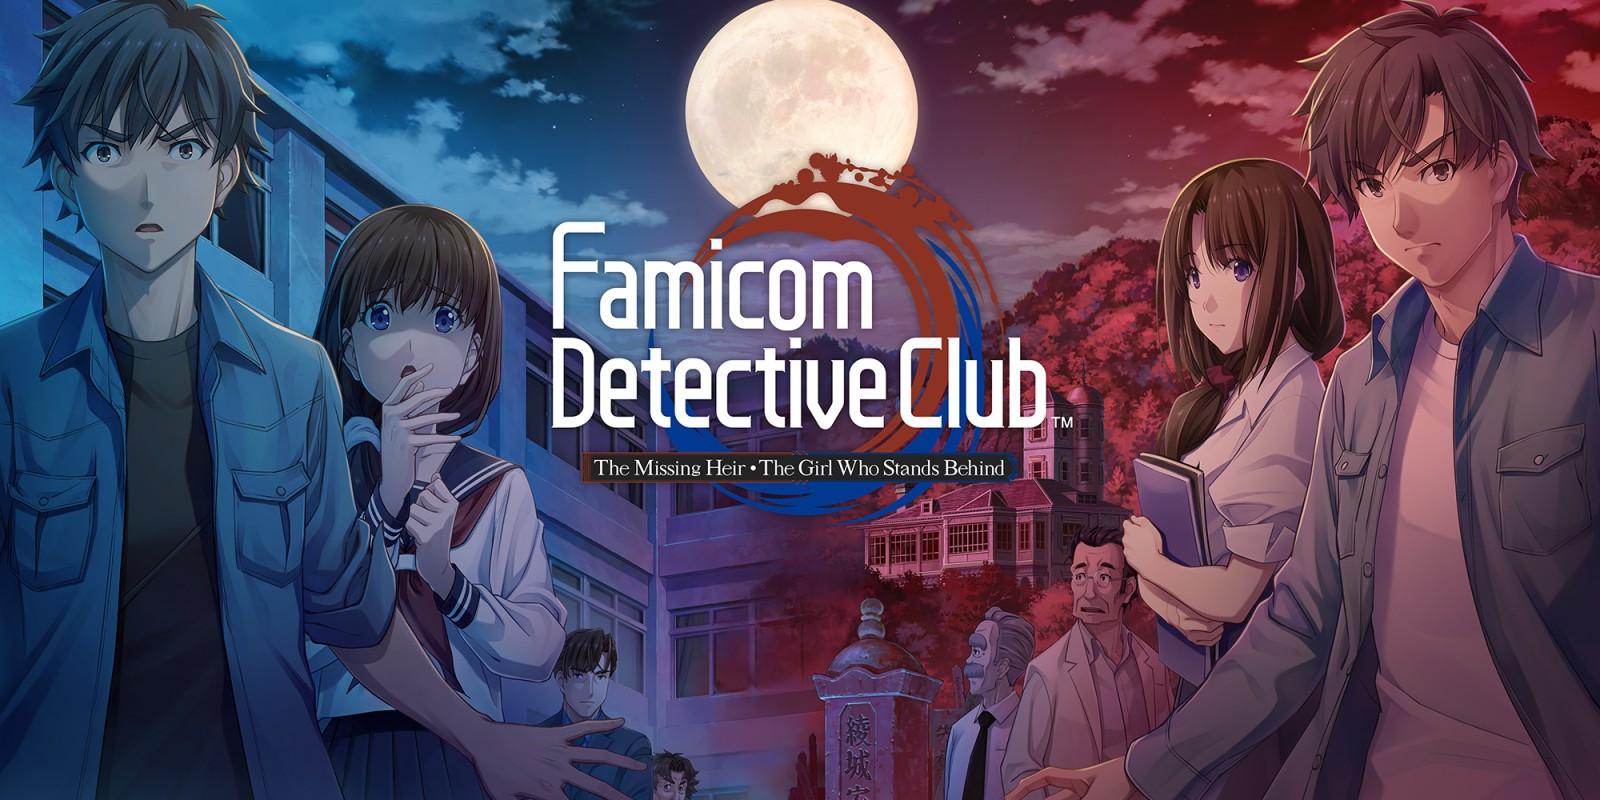 Famicom Detective Club: The Missing Heir & Famicom Detective Club: The Girl Who Stands Behind | Programas descargables Nintendo Switch | Juegos | Nintendo